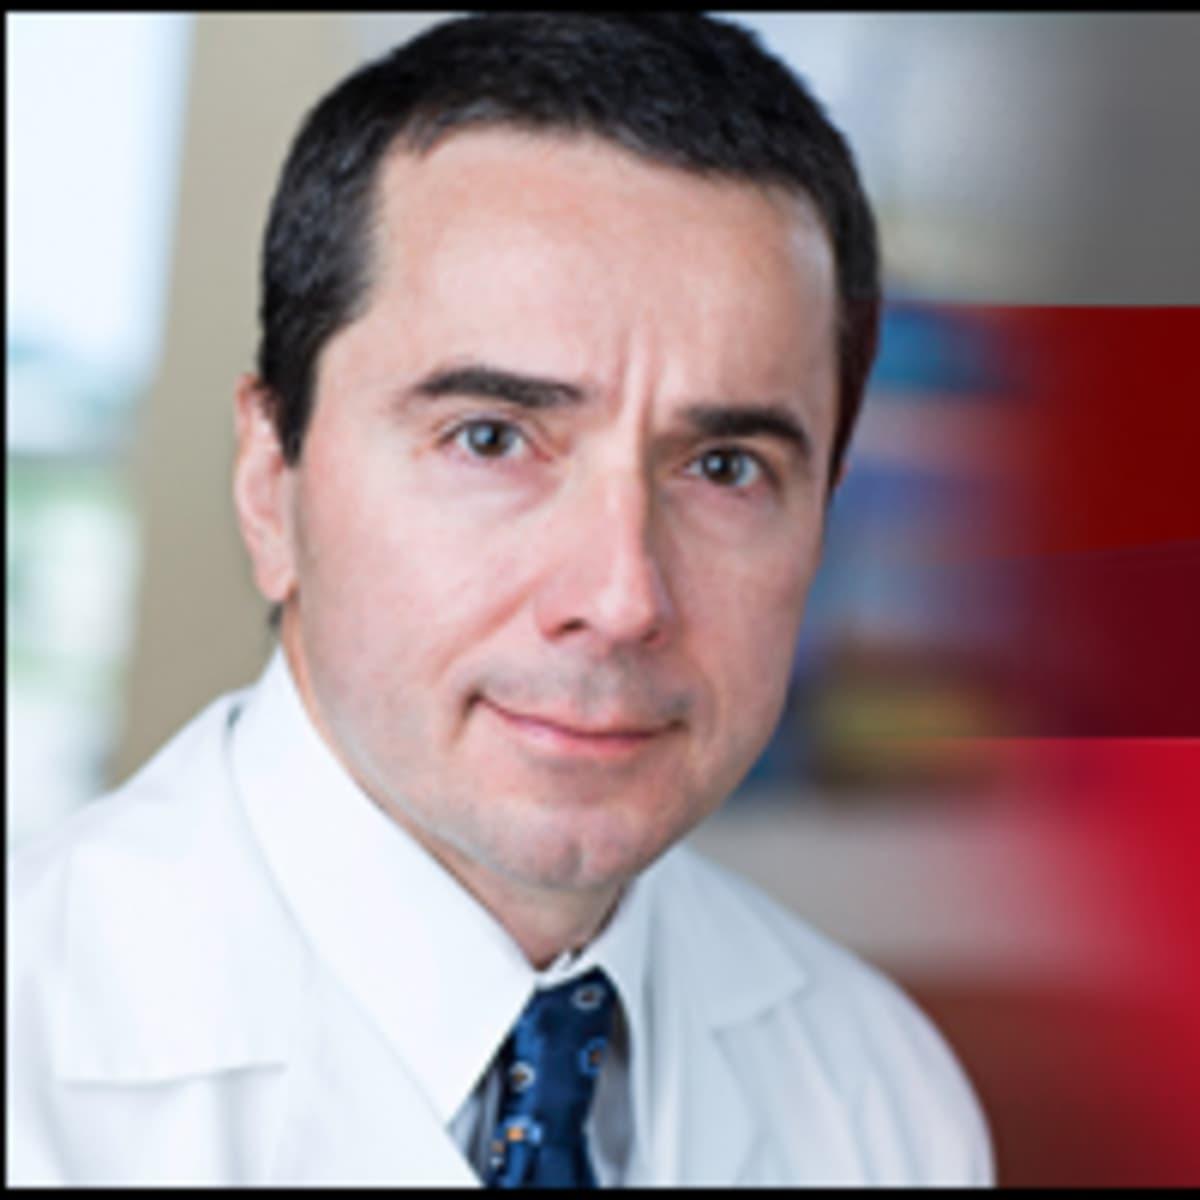 Dr James Wudel Md Lincoln Ne Vascular Surgeon